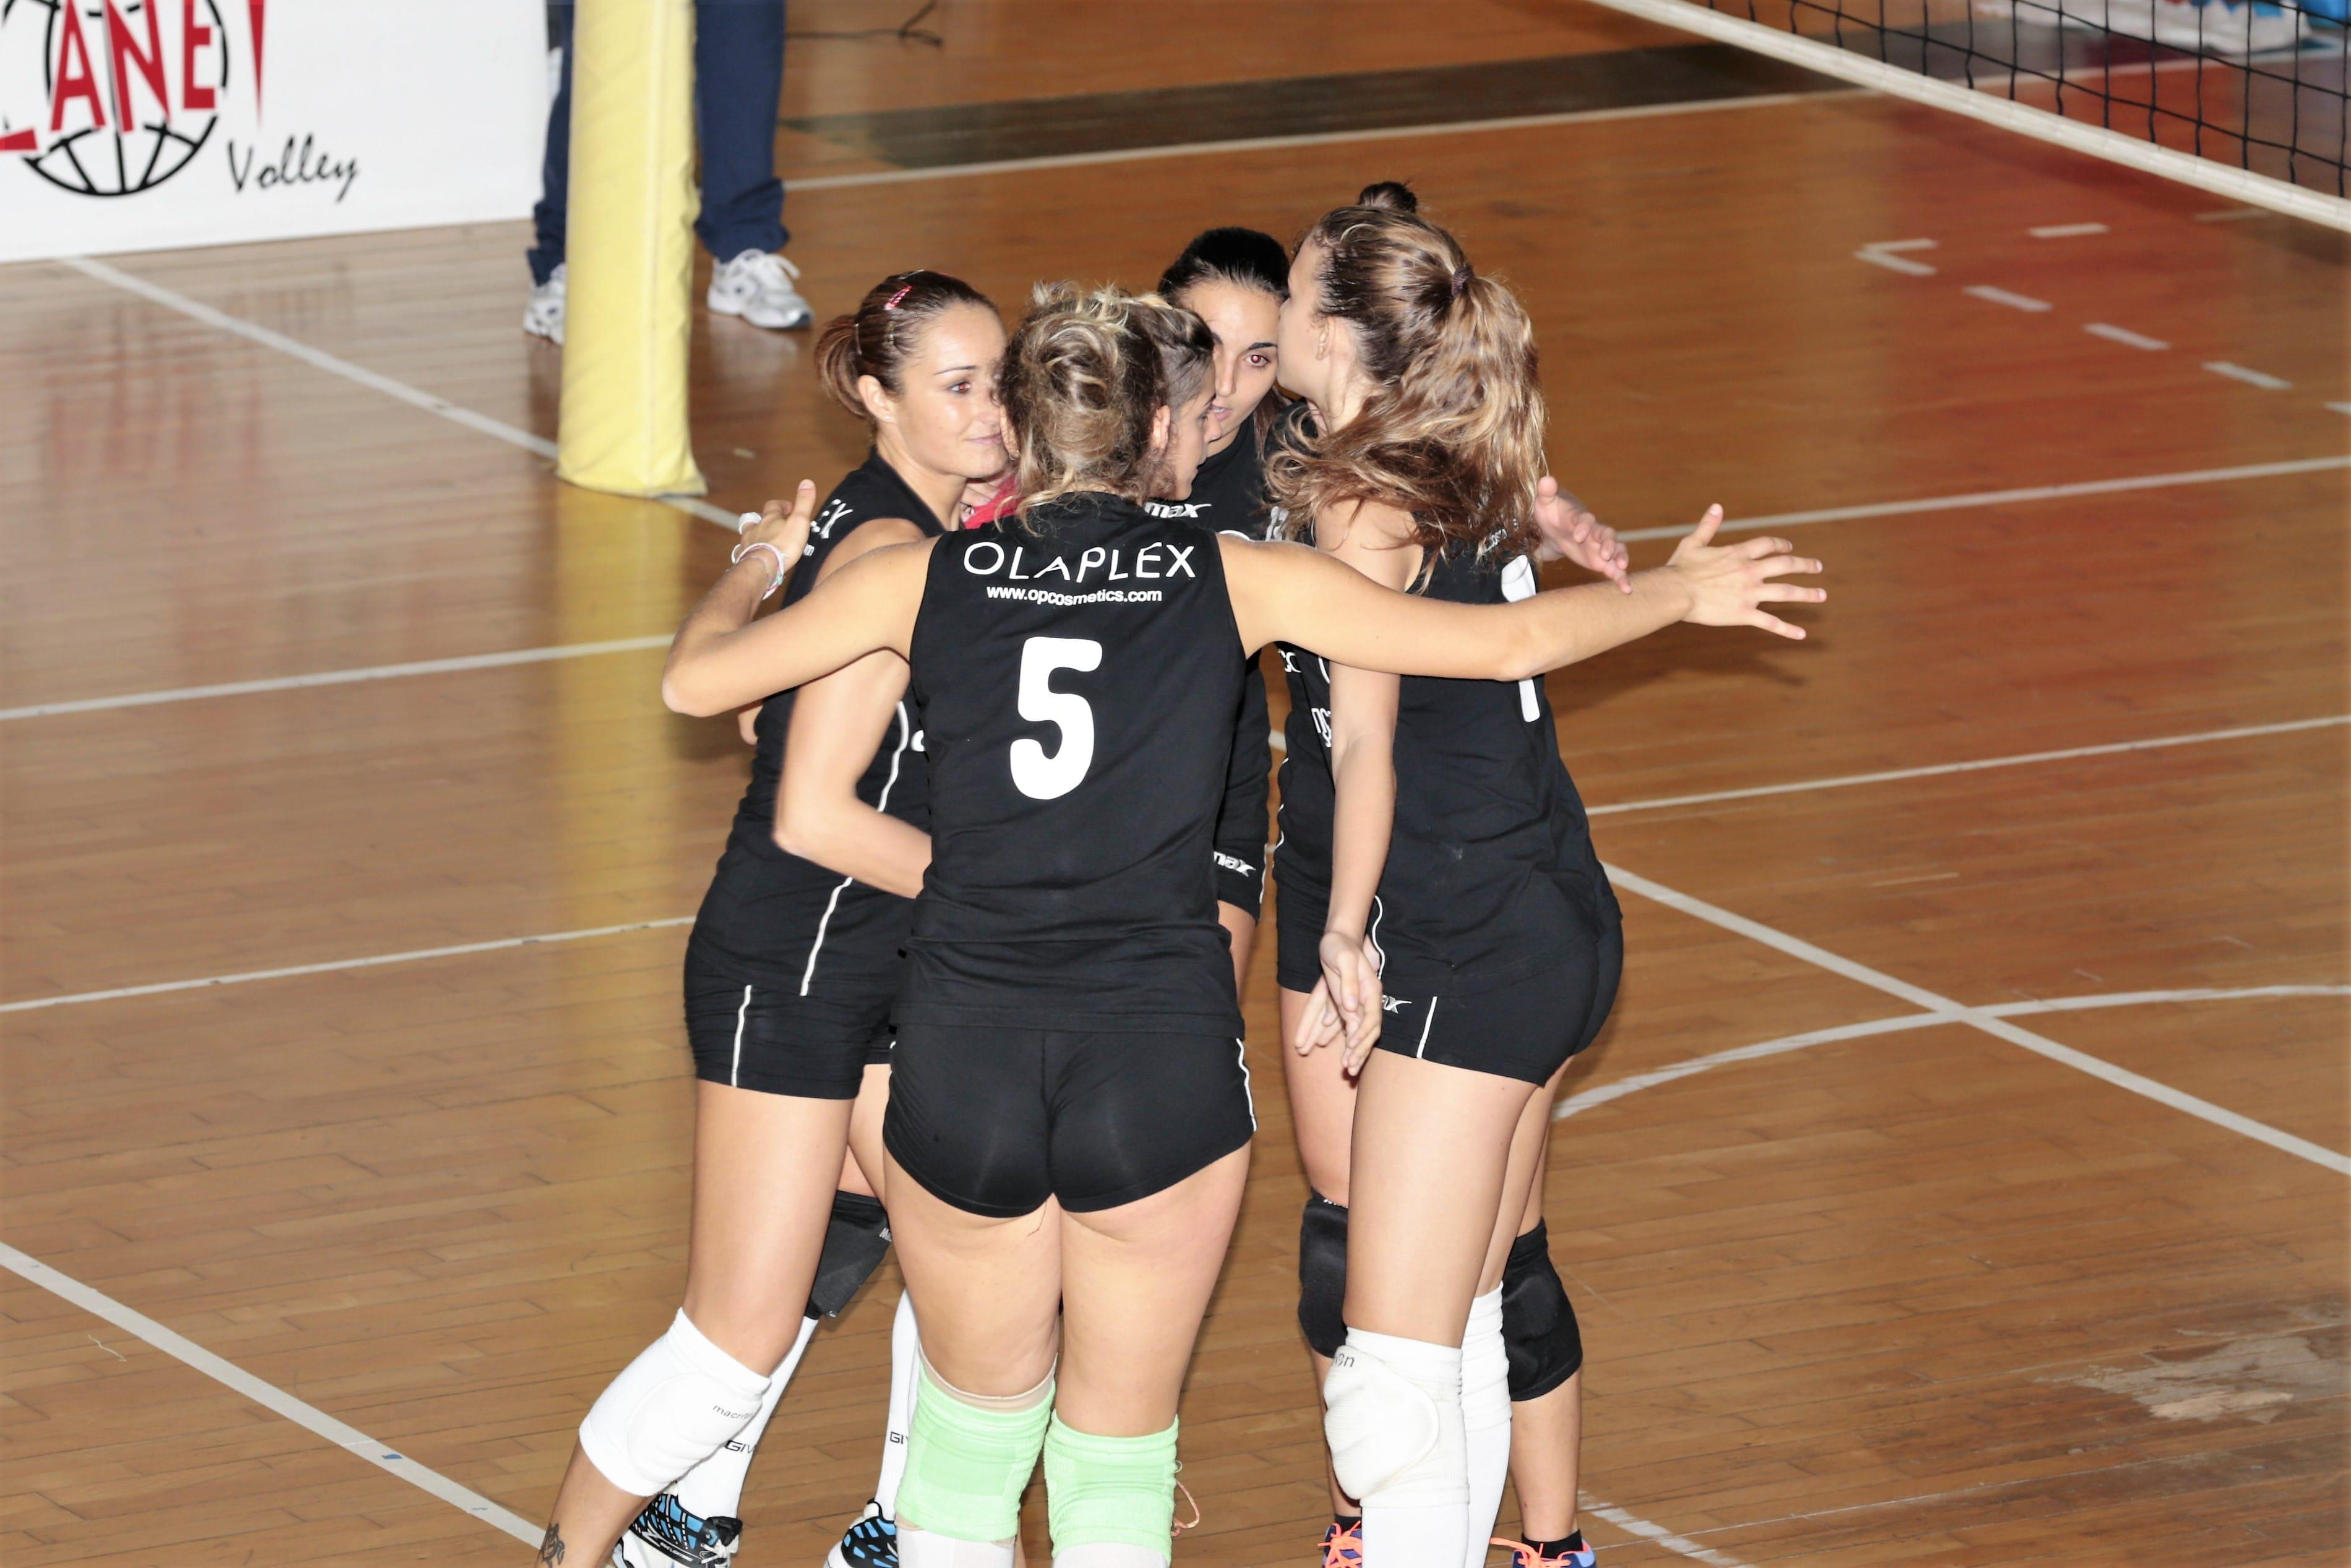 Squadra 3 Planet Volley - OP e lo sport